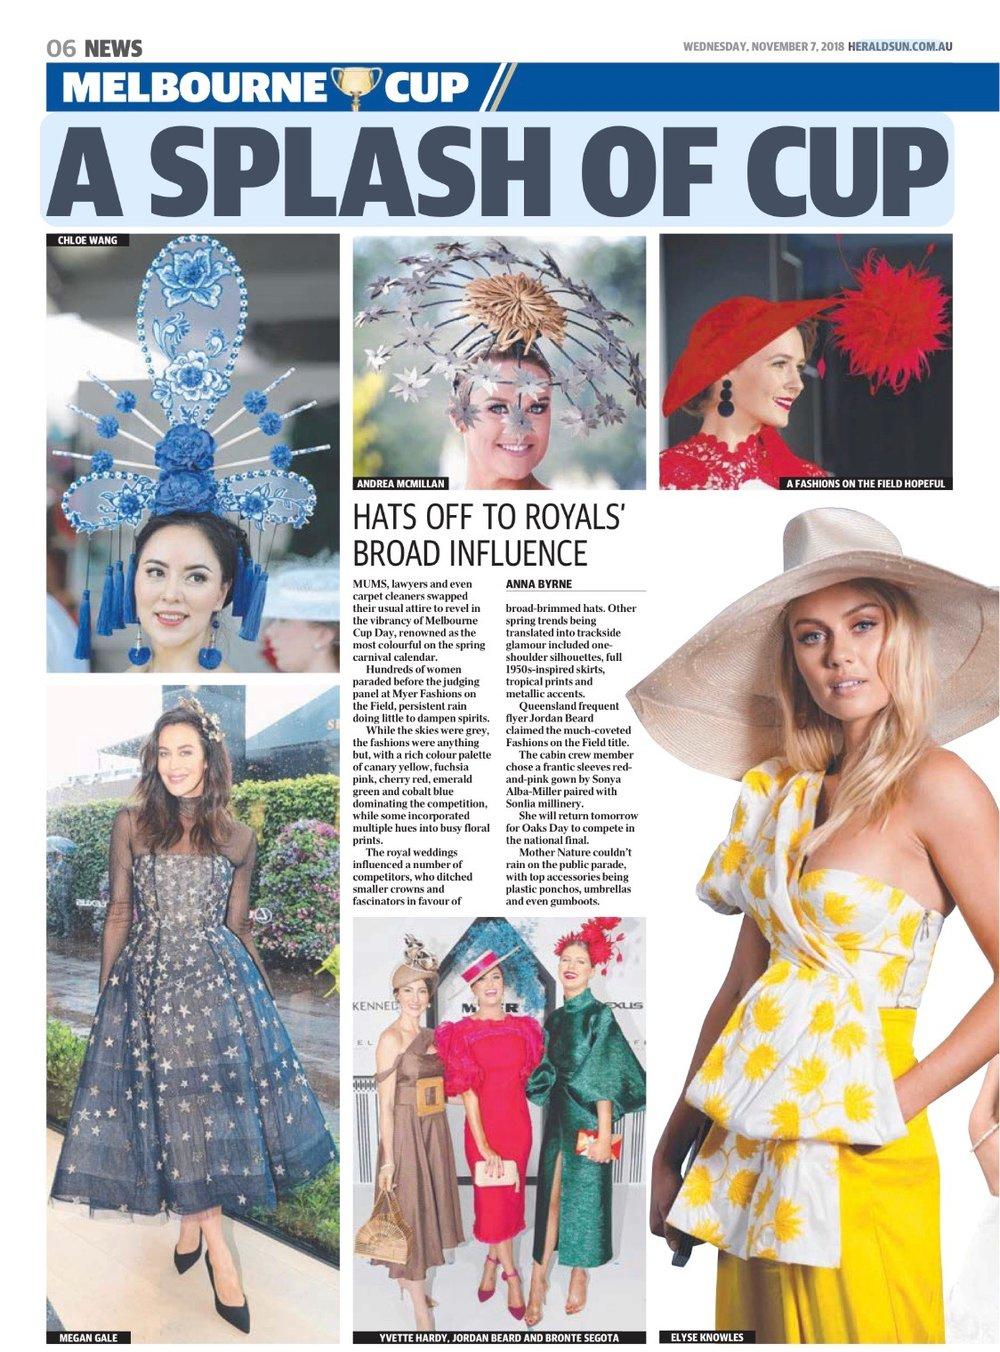 Herald Sun - Elyse Knowles